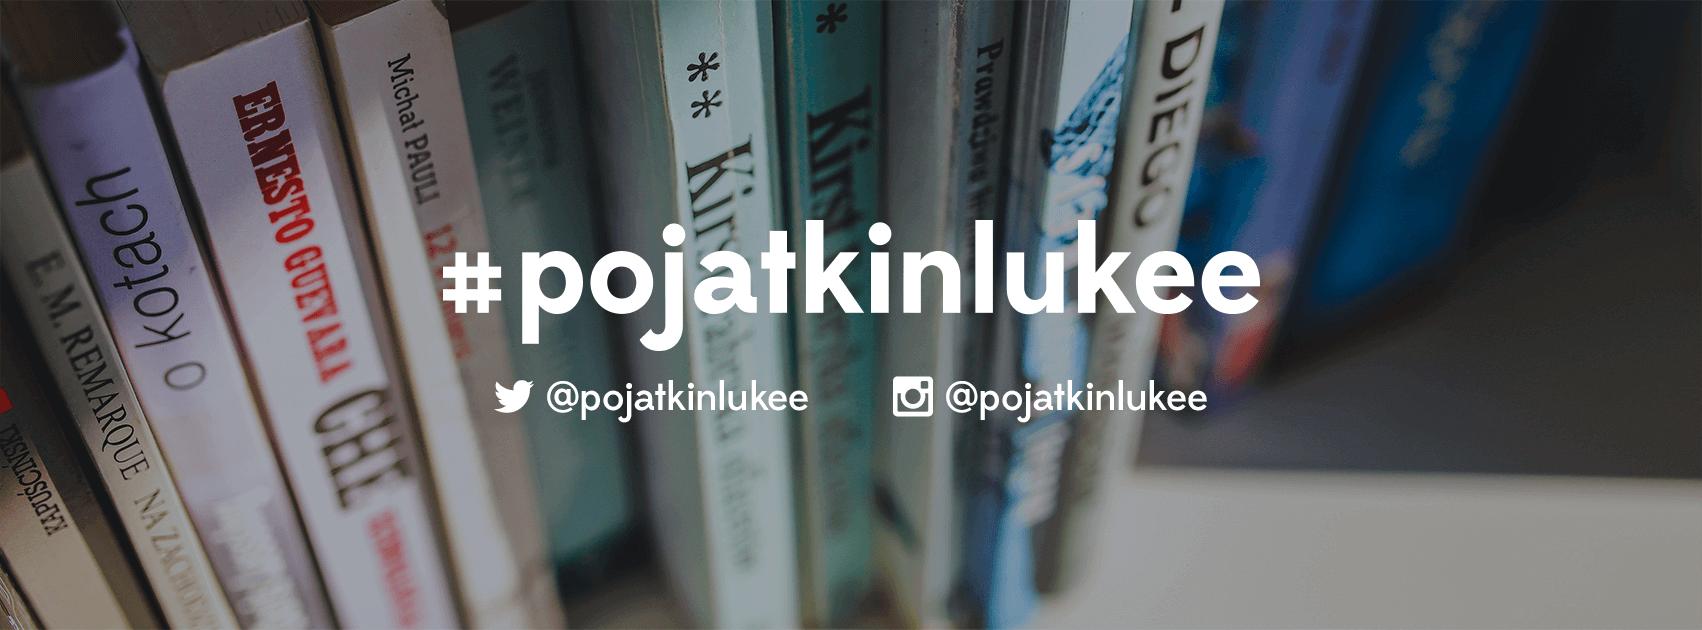 pojatkin_lukee_cover